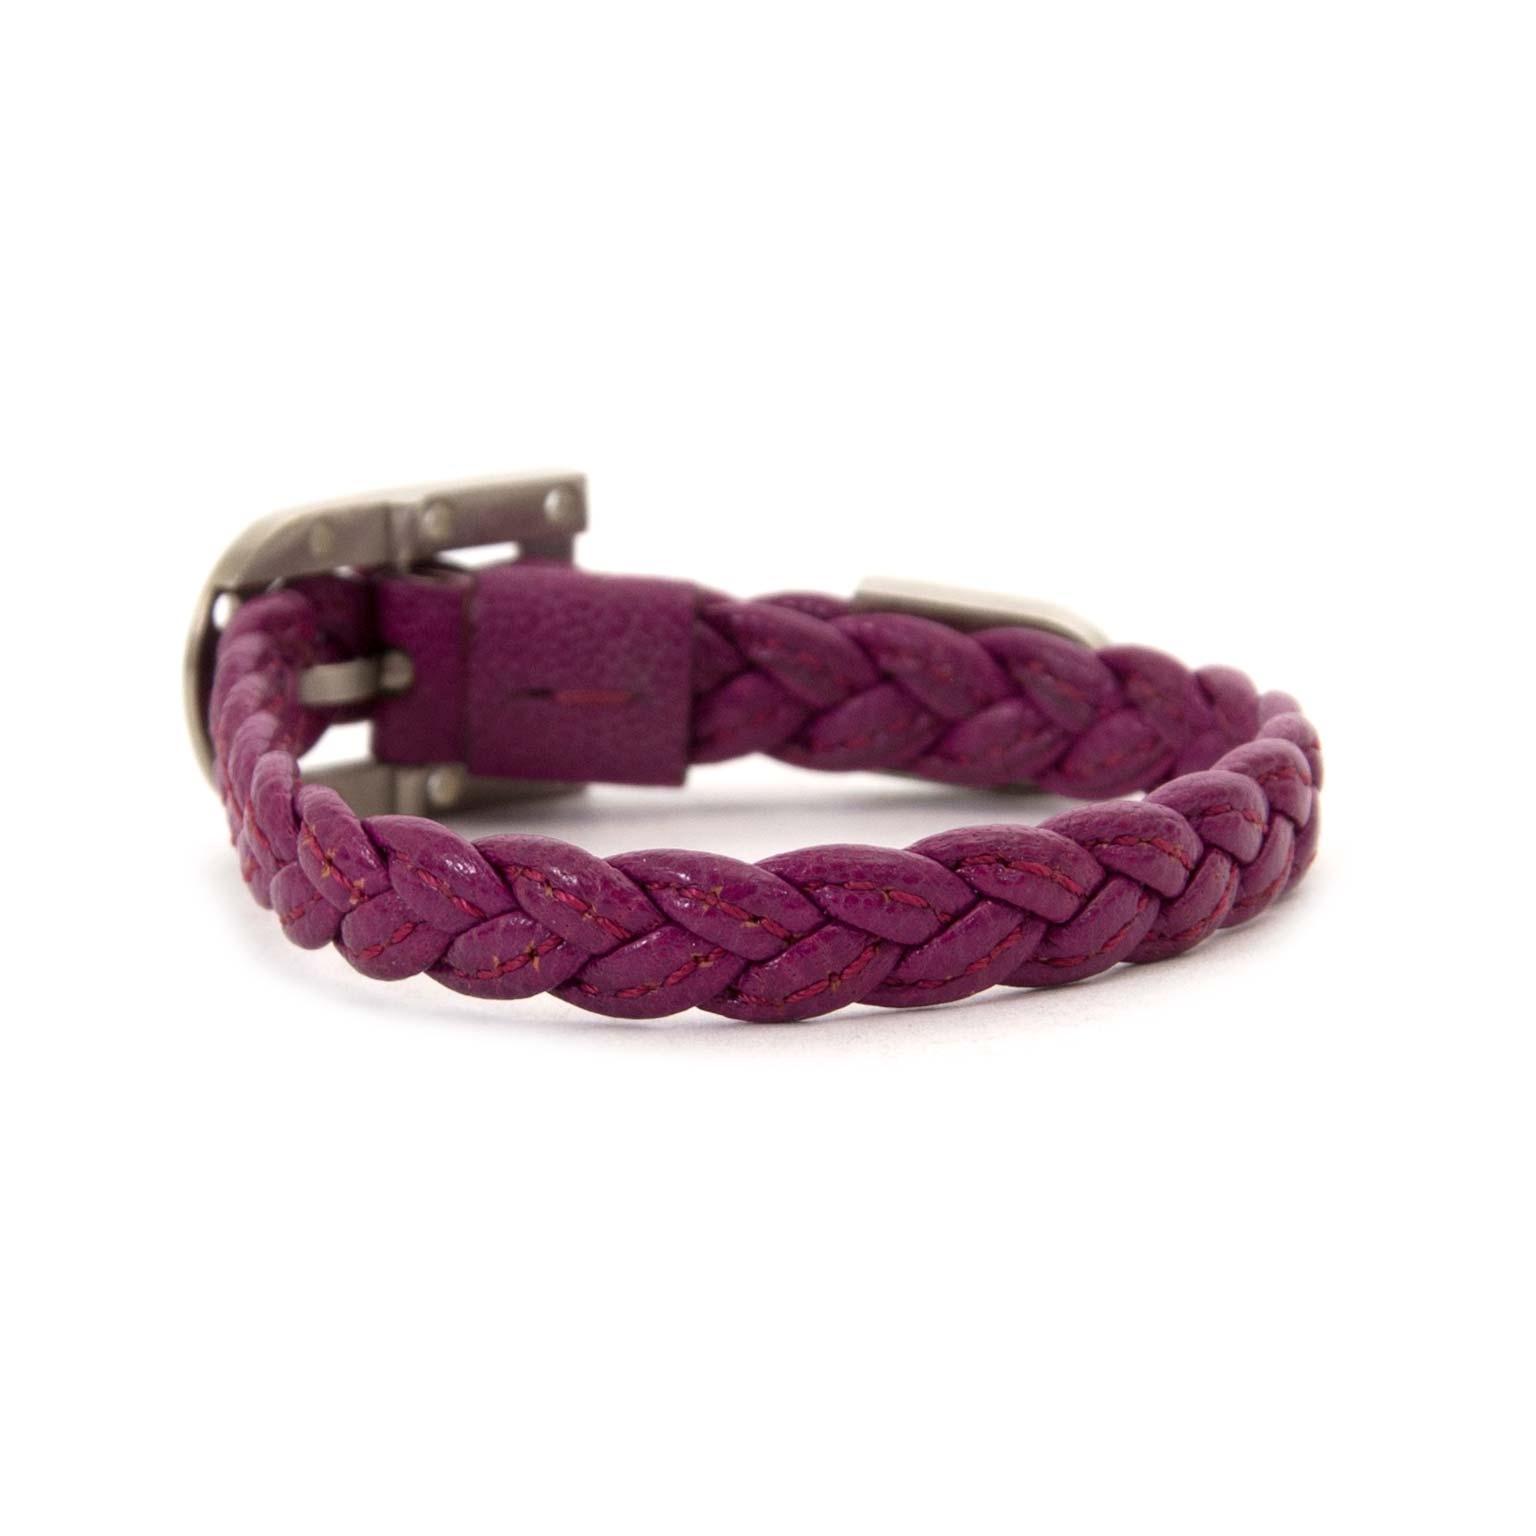 delvaux purple braided leather bracelet now for sale at labellov vintage fashion webshop belgium